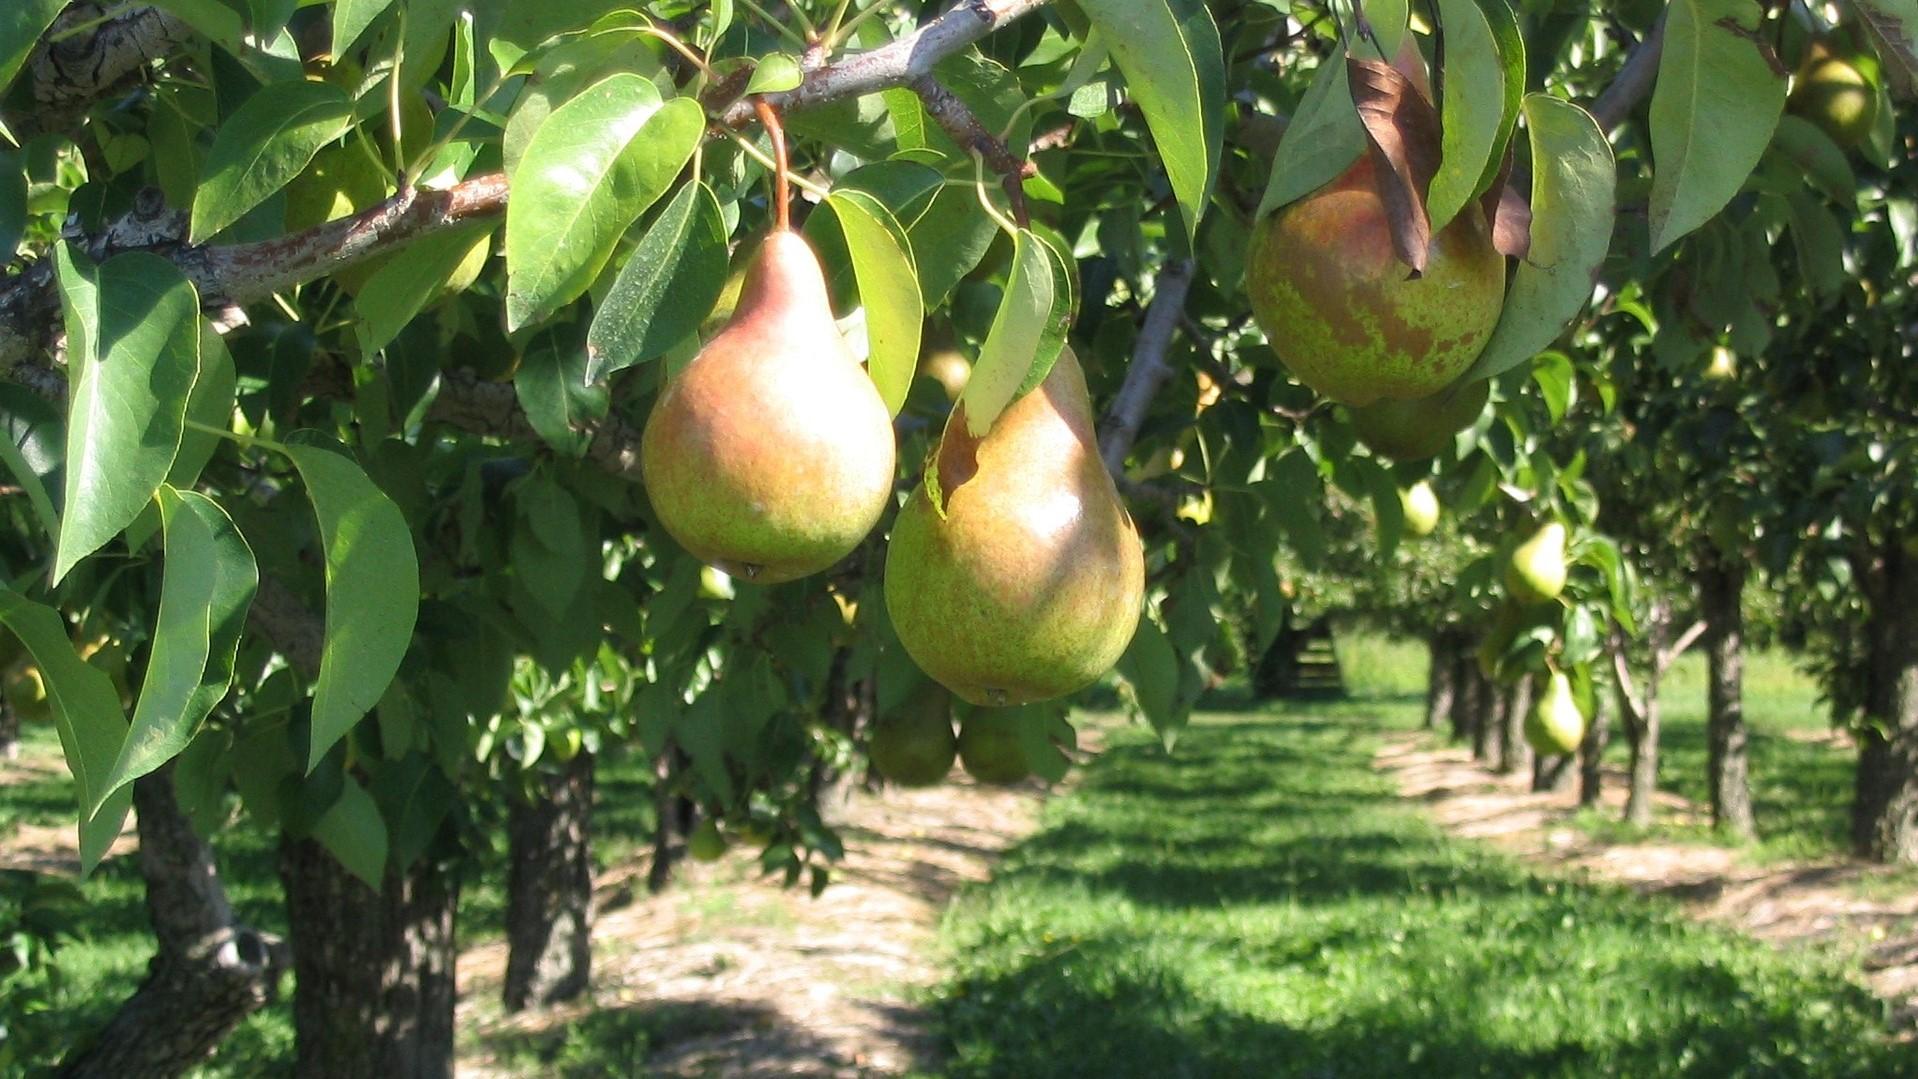 vAttract Bees - flower - fruit - pear tree